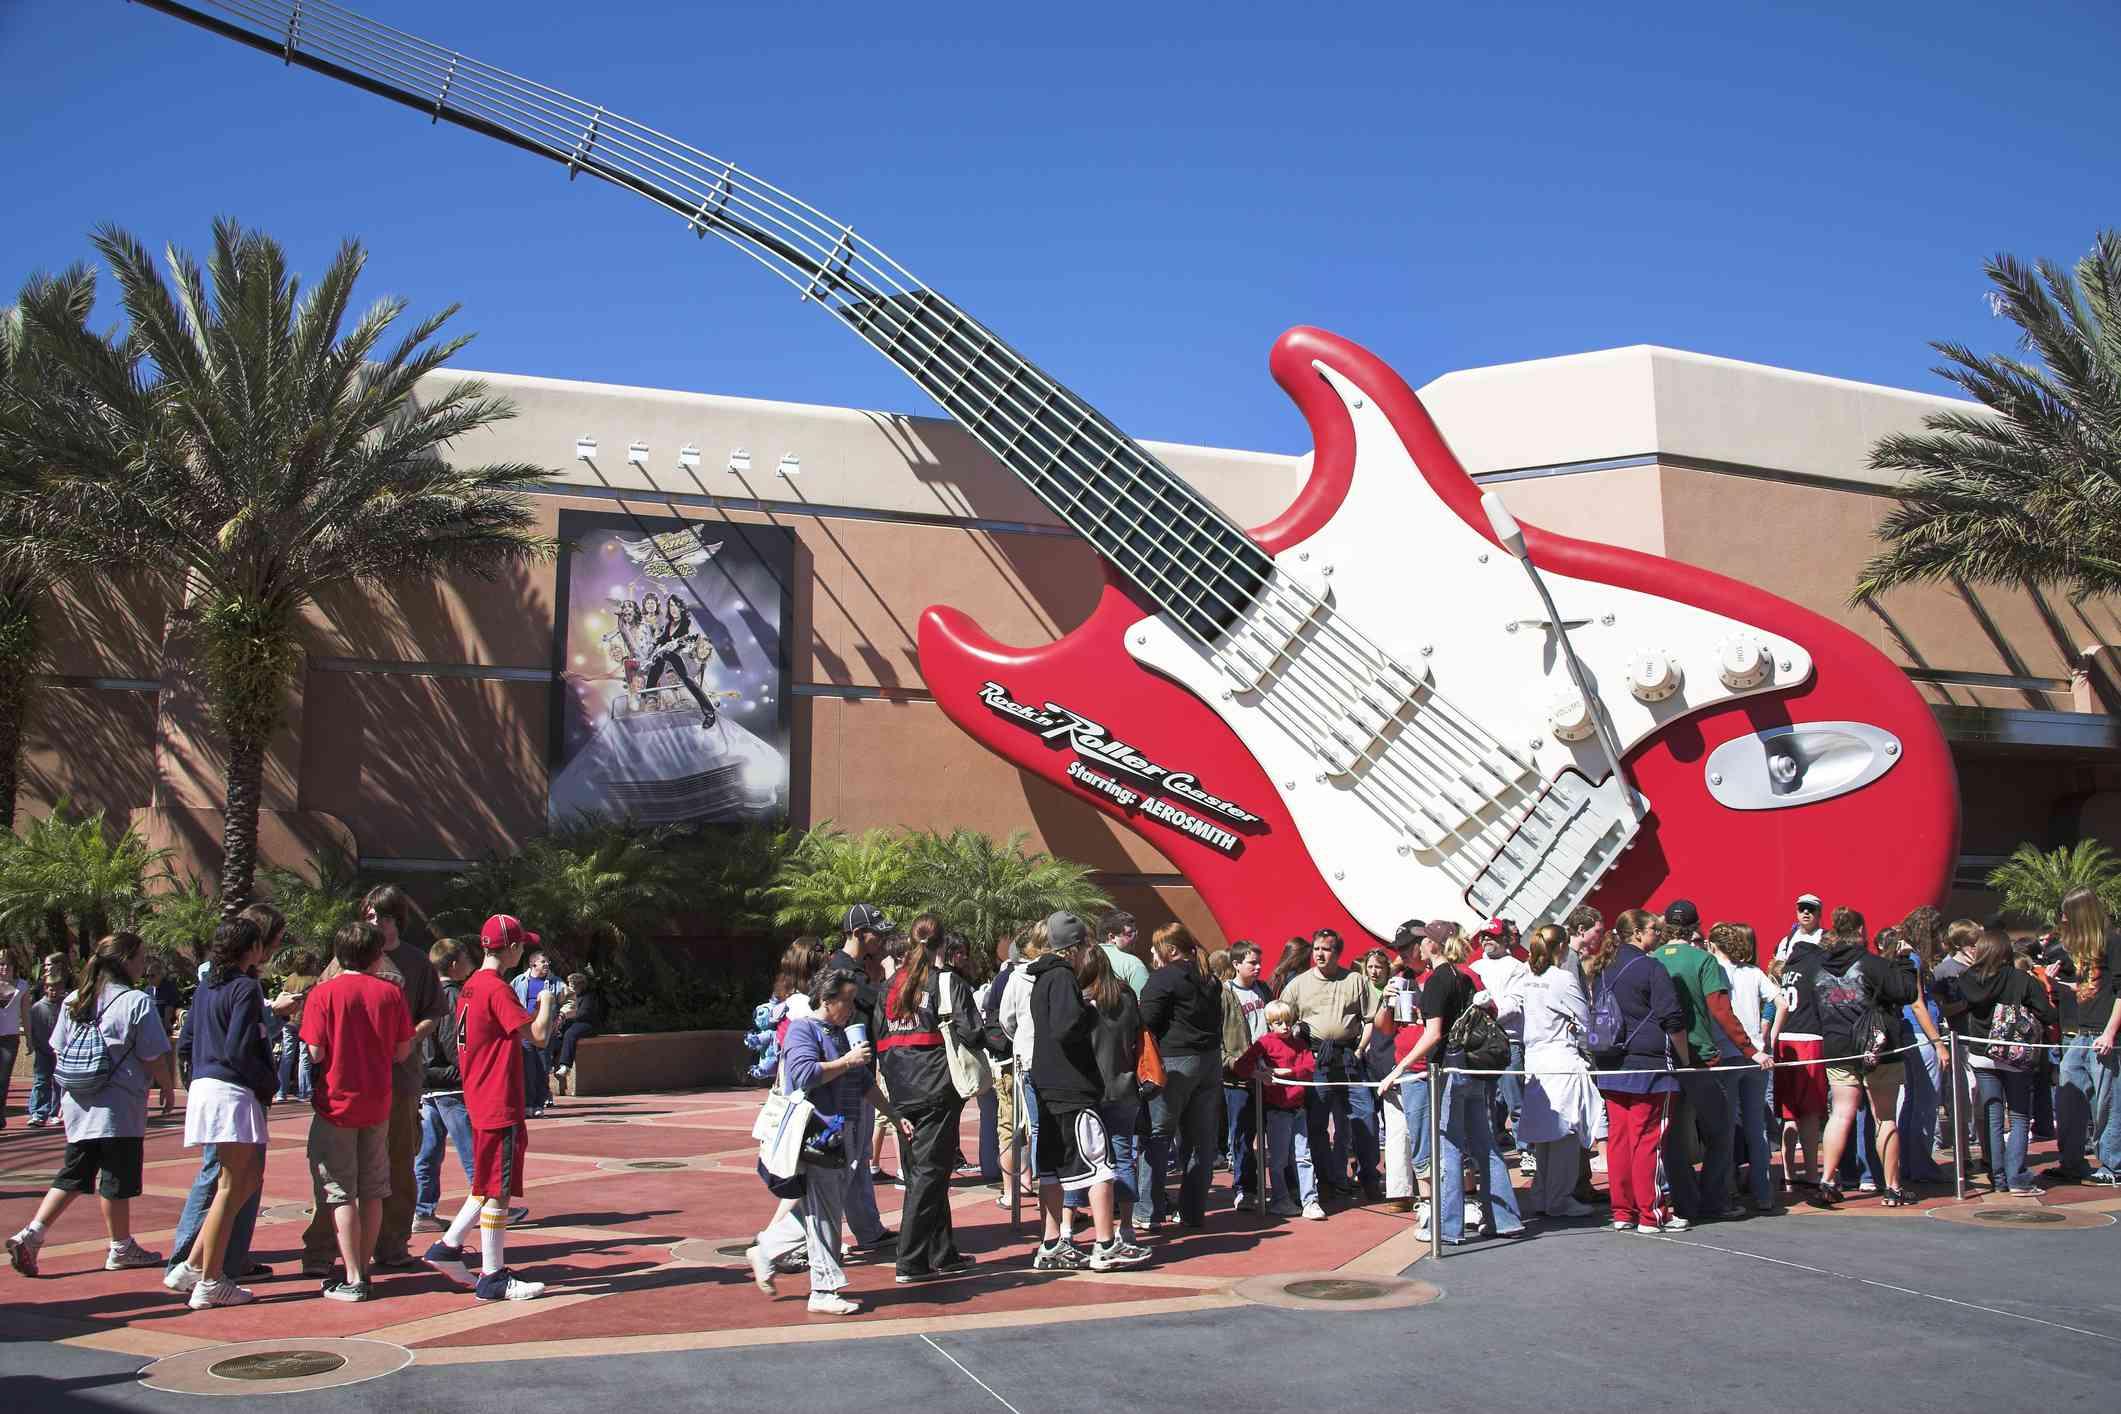 Rock n Roller Coaster sign in Orlando